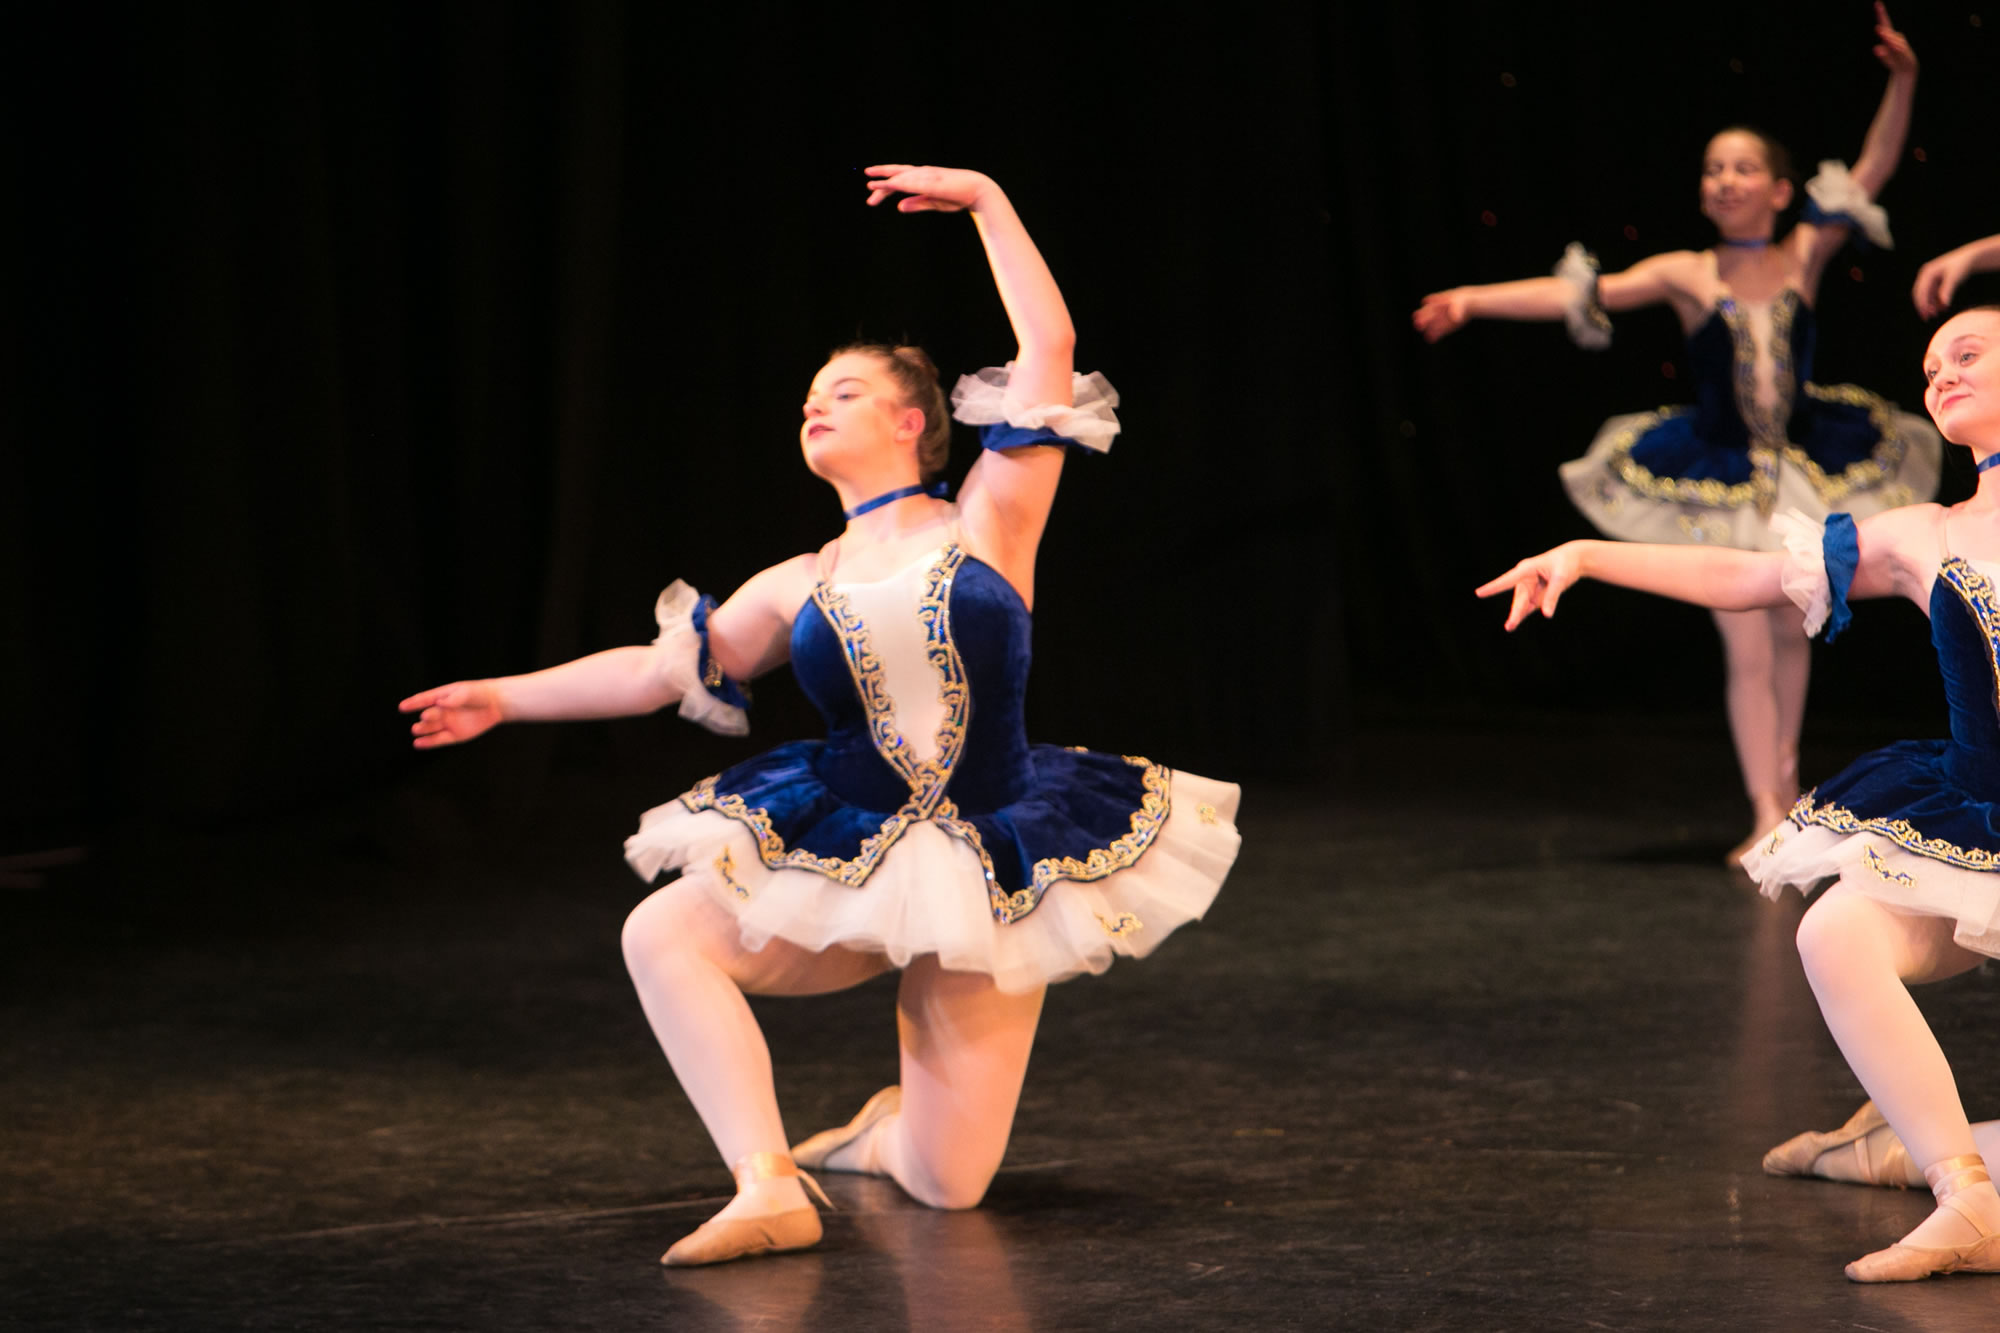 Hitchin_School_of_Dance_Show_2019-SM1_2813.jpg